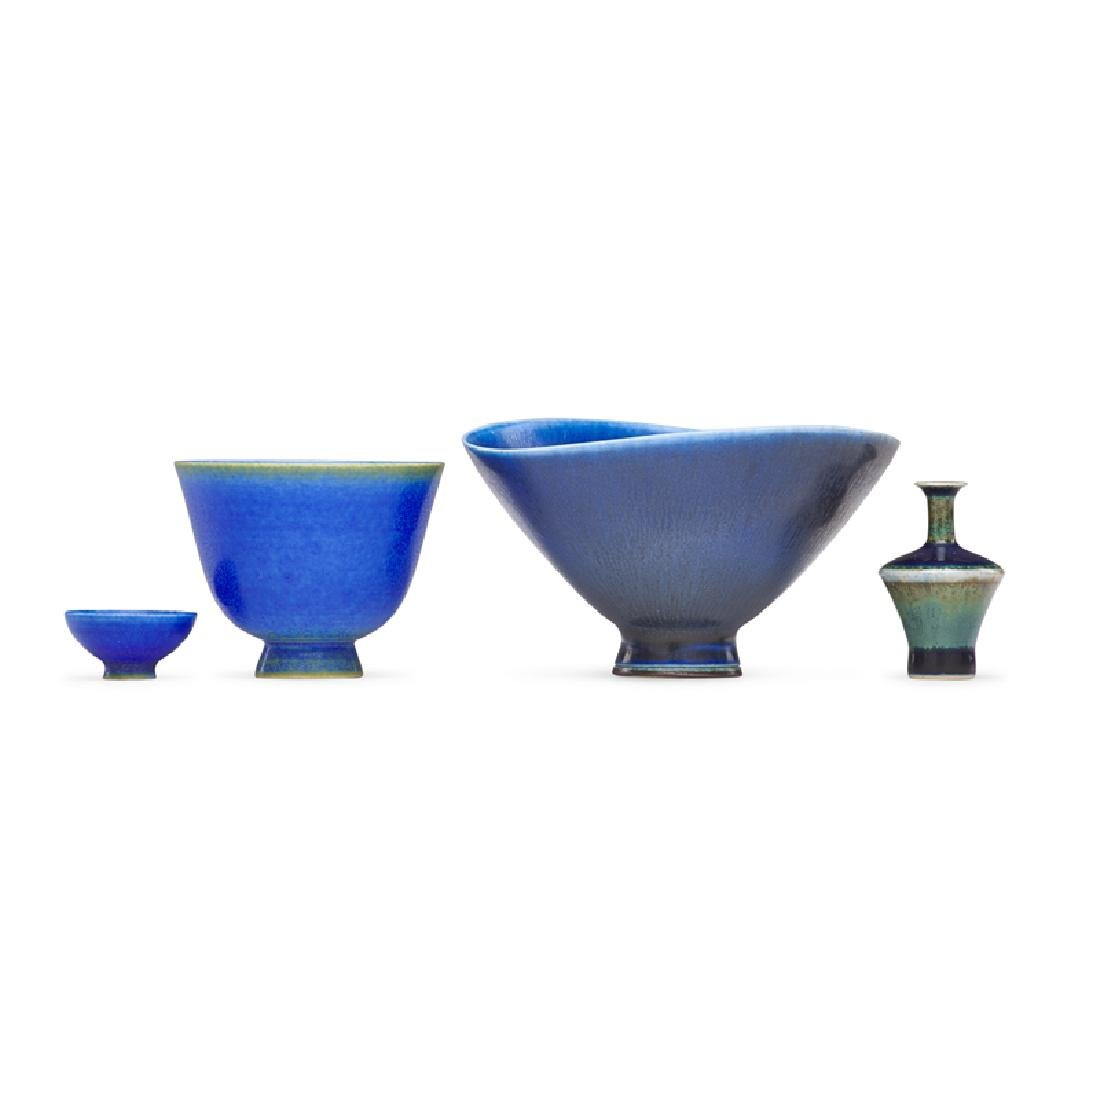 BERNDT FRIBERG ETC. Four miniature vases